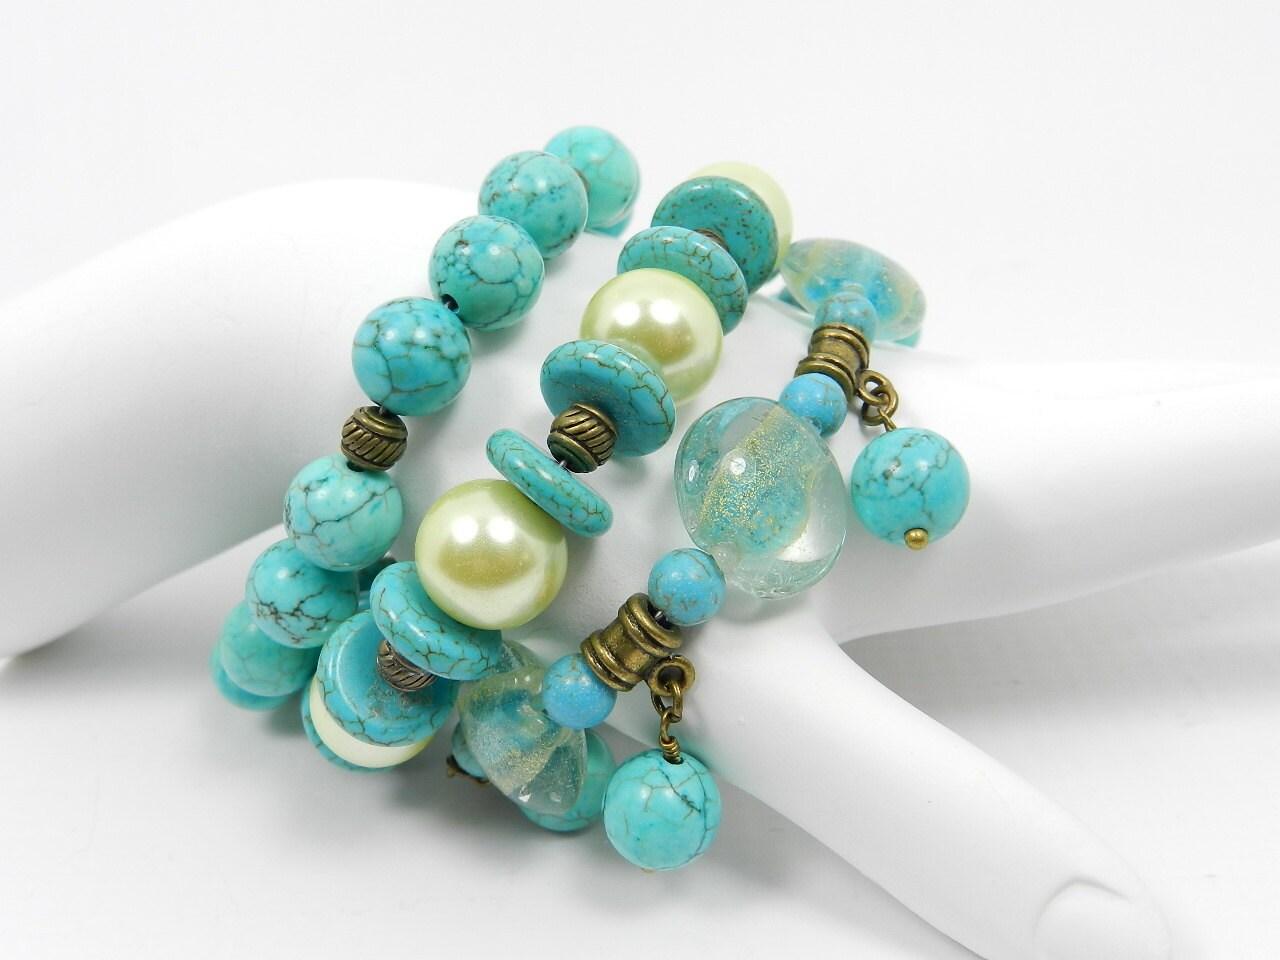 Turquoise Bracelet Stacked Bracelet Stack of by BeadzNBling